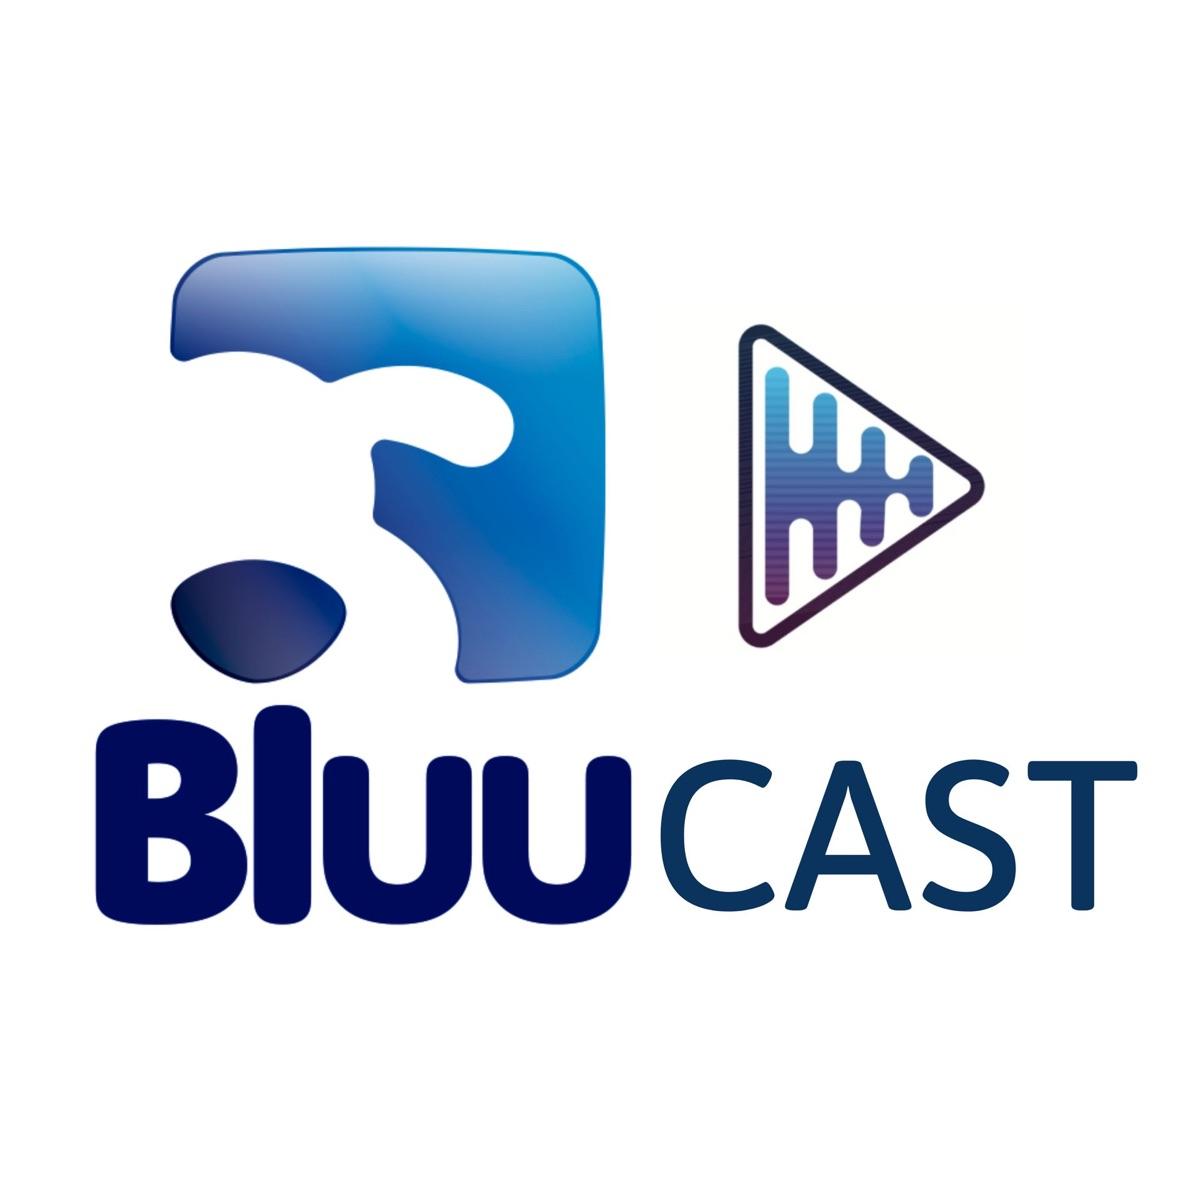 Bluucast - O podcast da Bluu